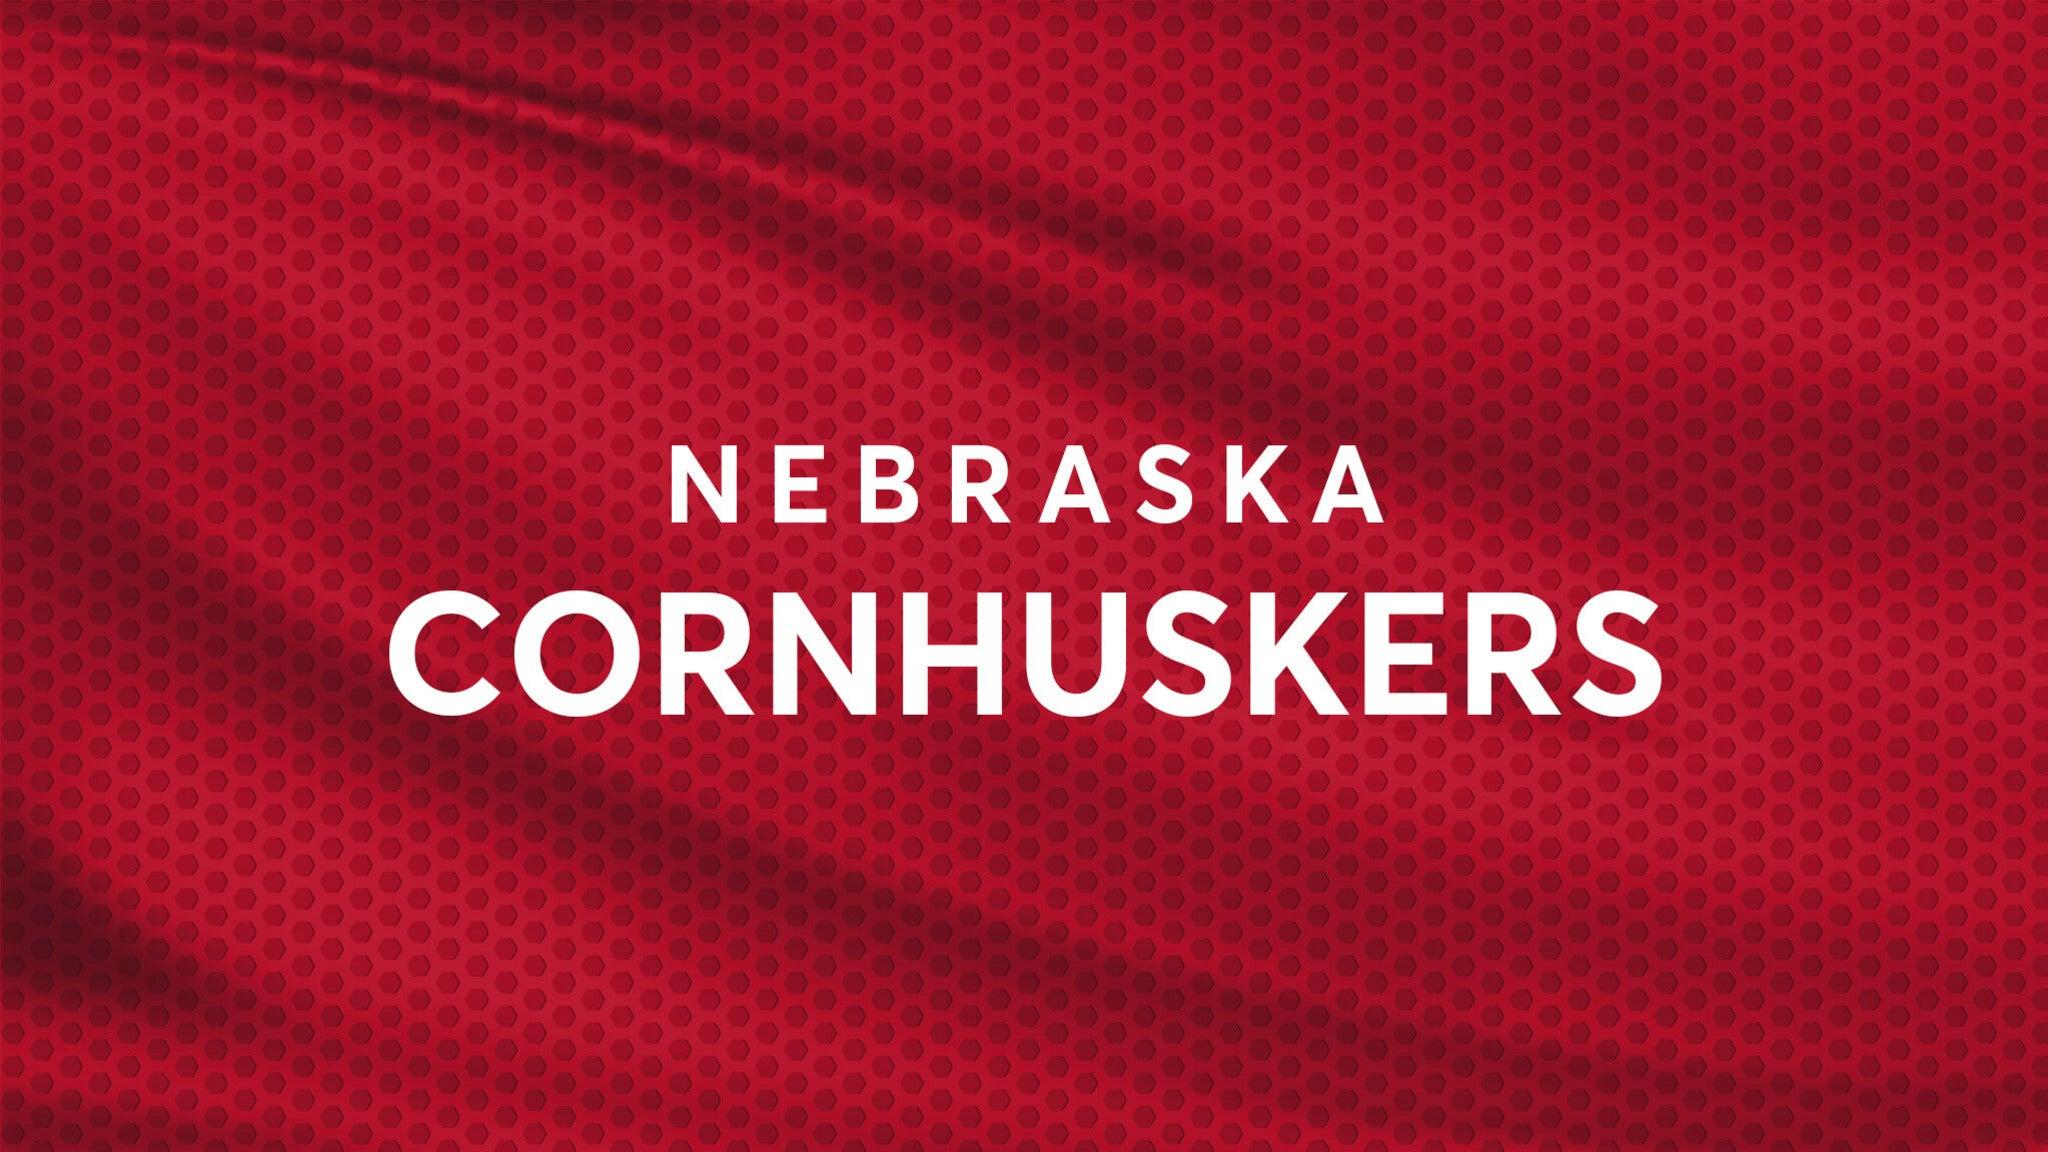 Nebraska Cornhuskers Baseball